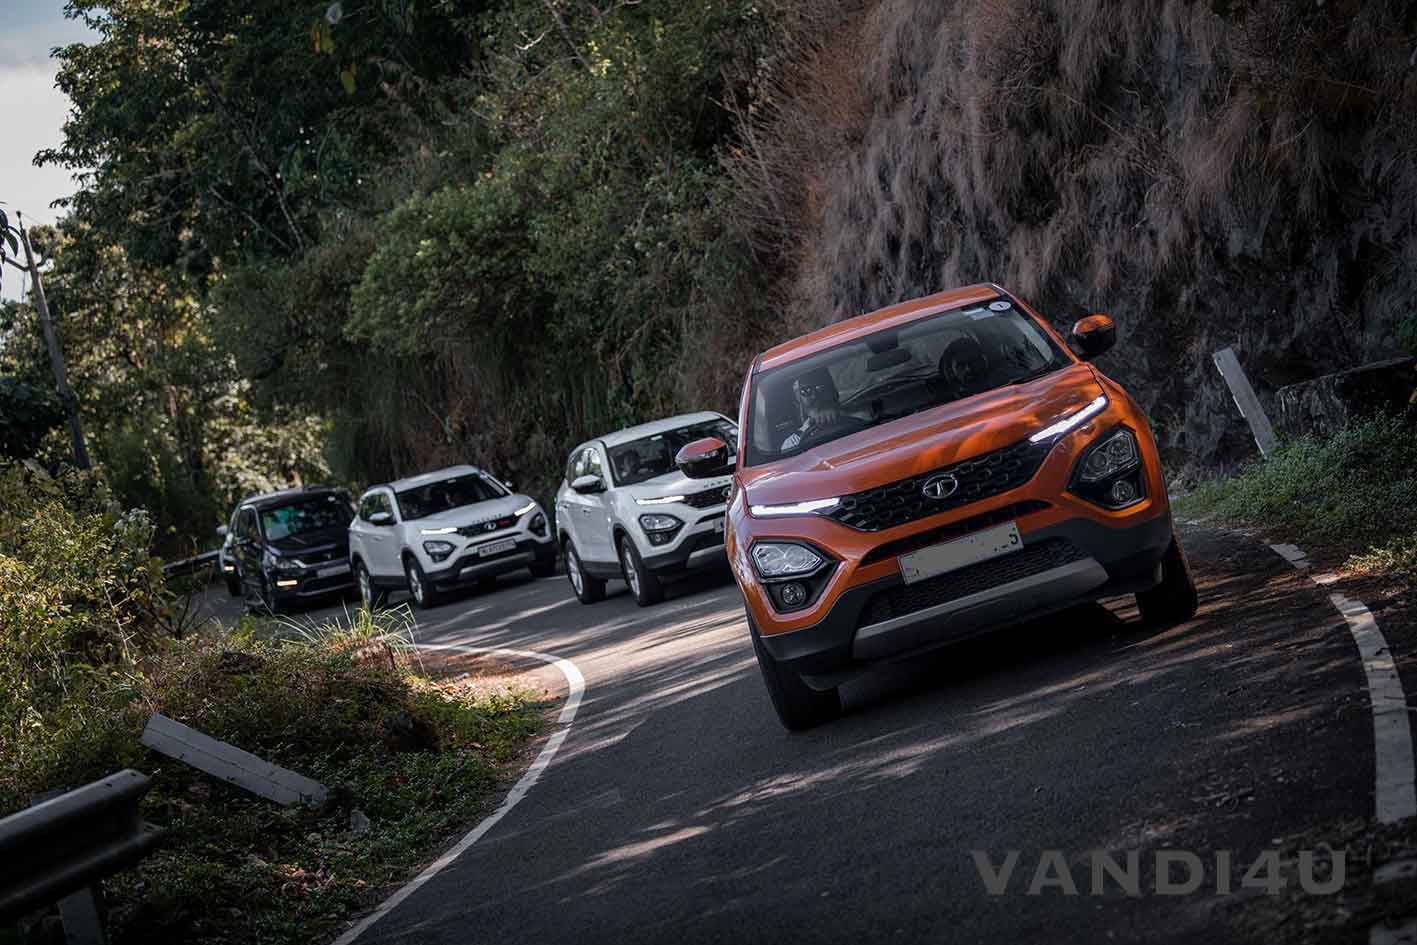 Tata Motors SUV Owners United League (SOUL) gearup for 2020 with its Iconic Kutch Drive | VANDI4U